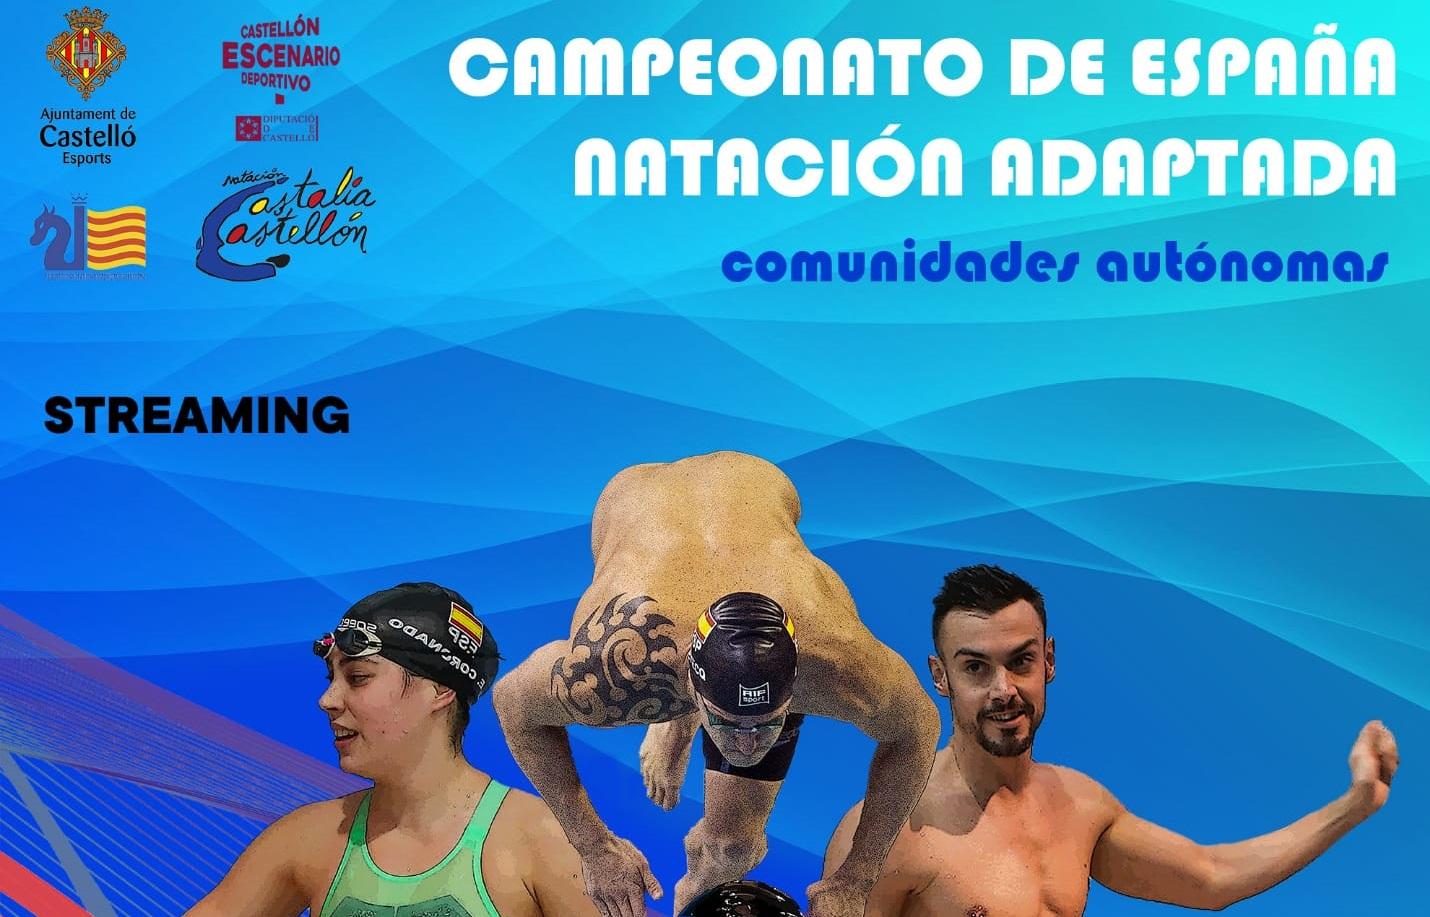 Natación adaptada. Fuente: Comité Paralímpico Español